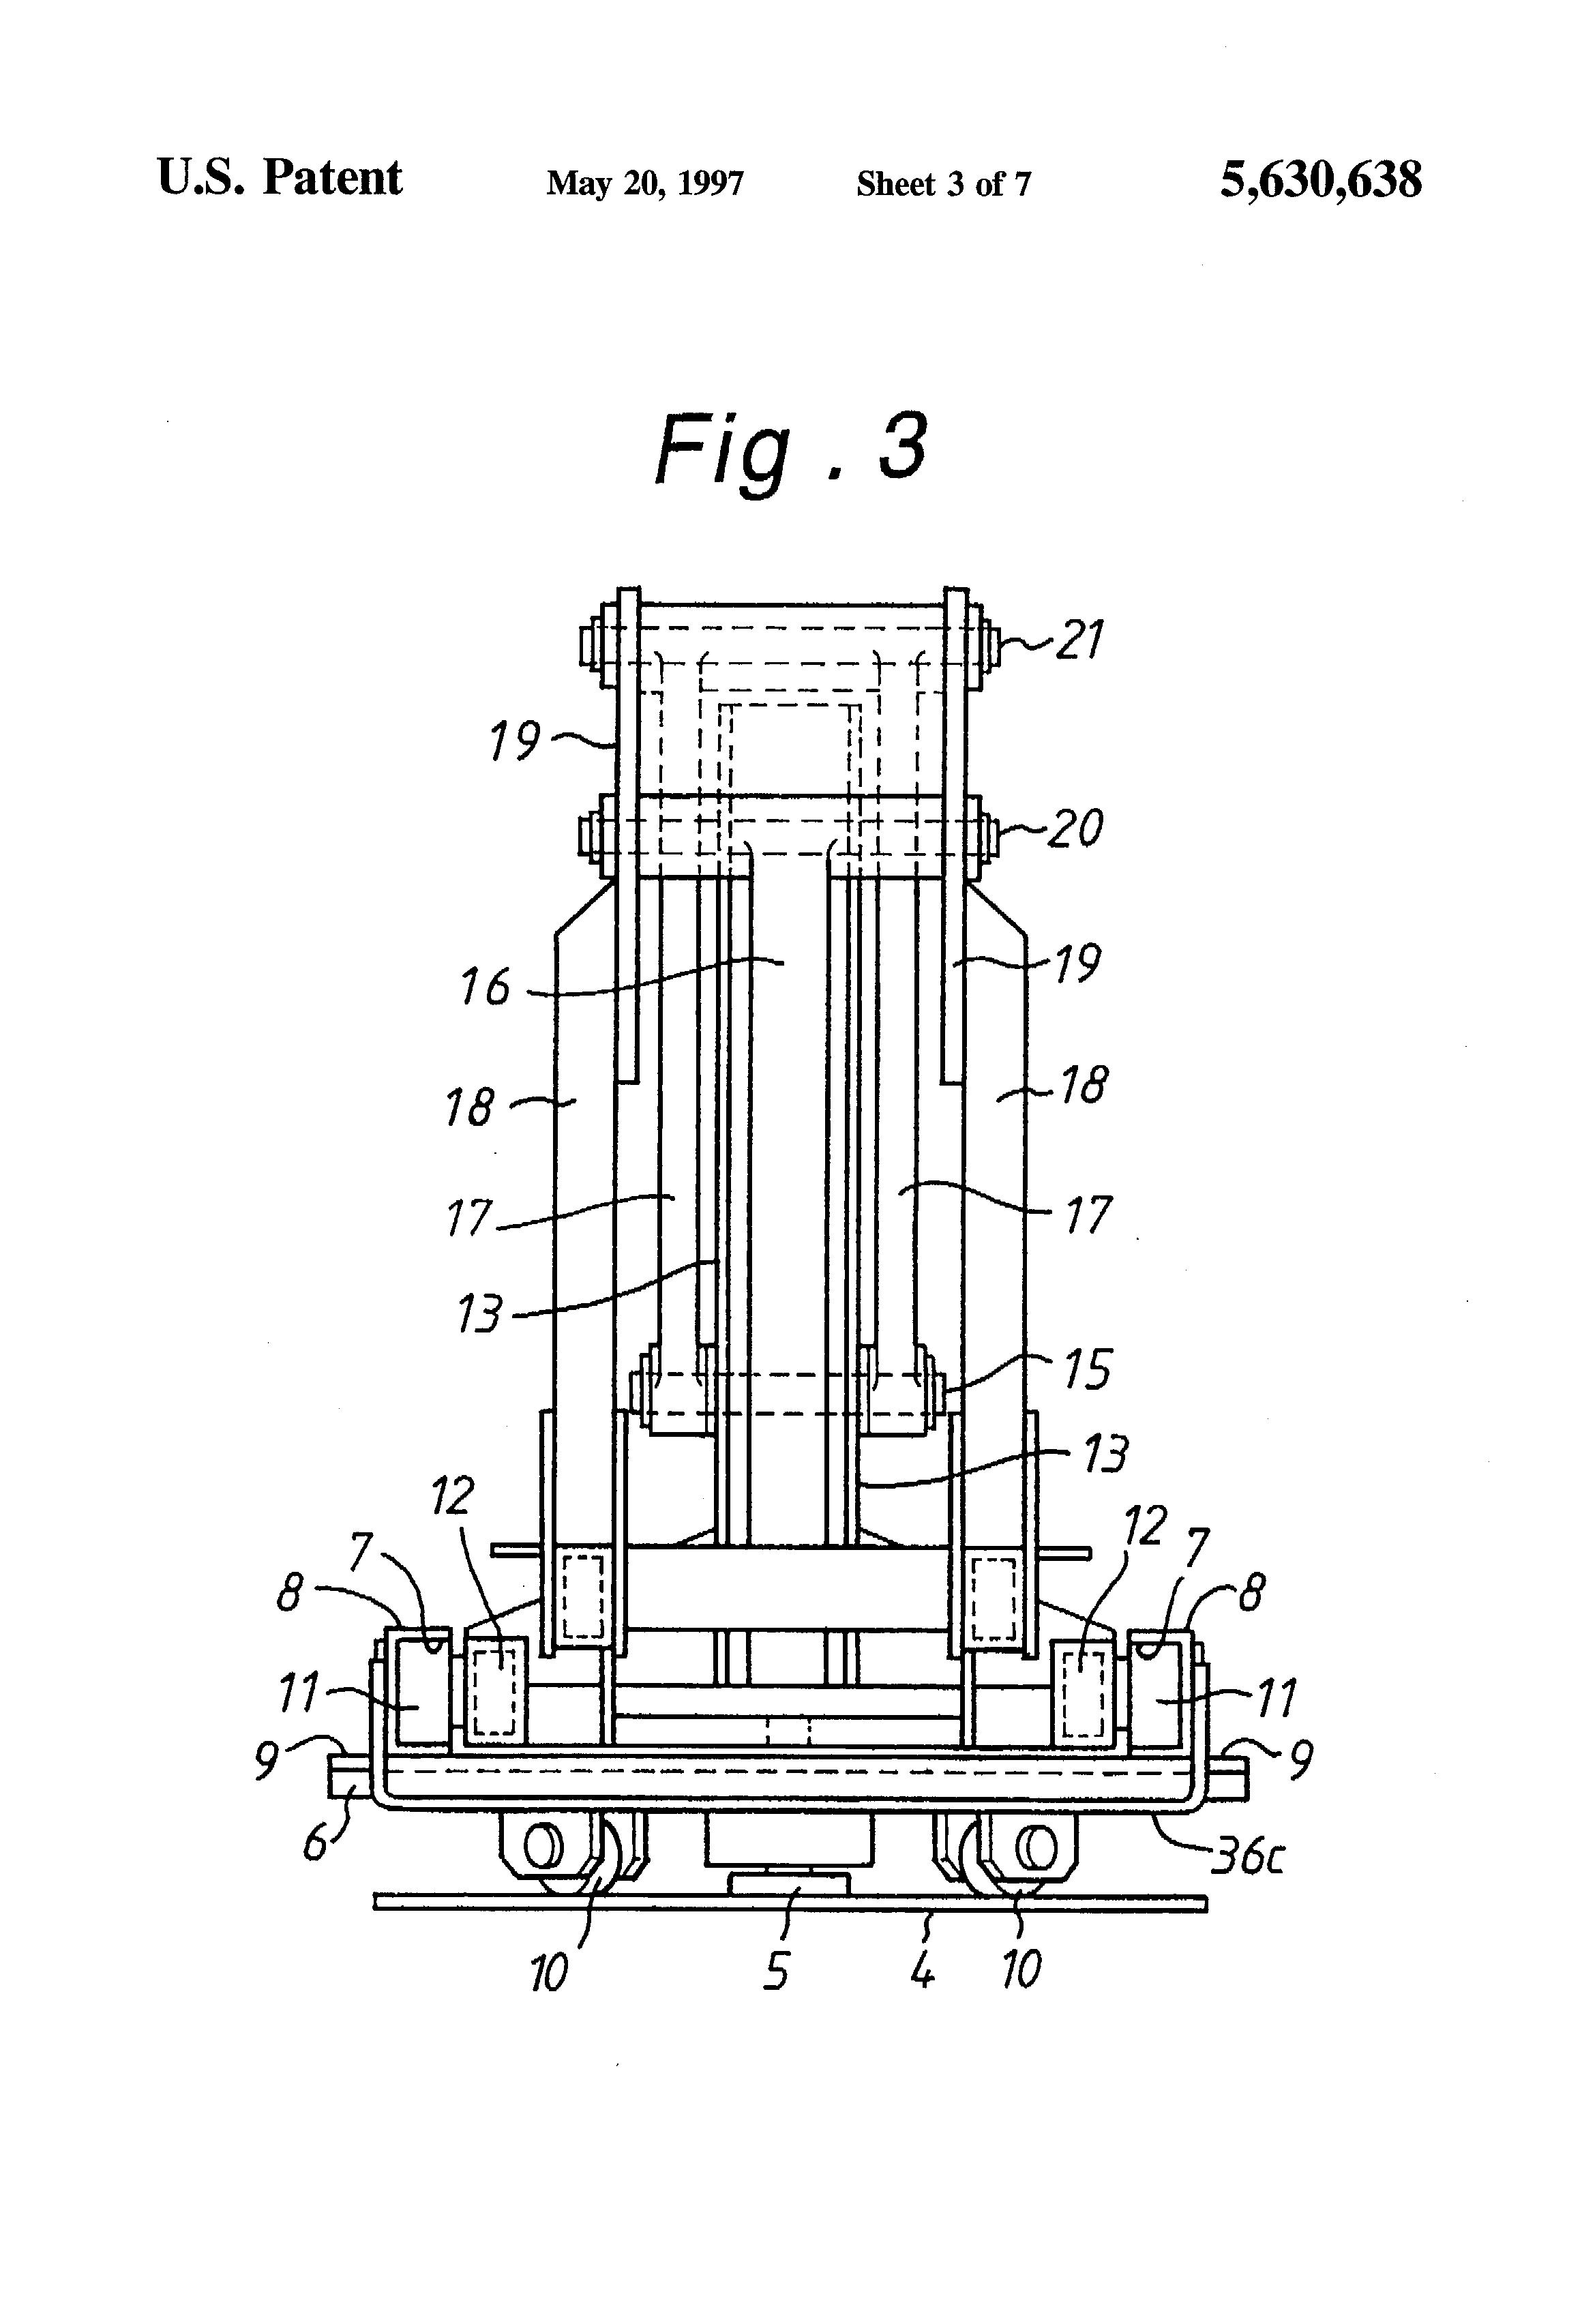 Seat Lift Mechanism : Patent us seat lift mechanism for an automotive